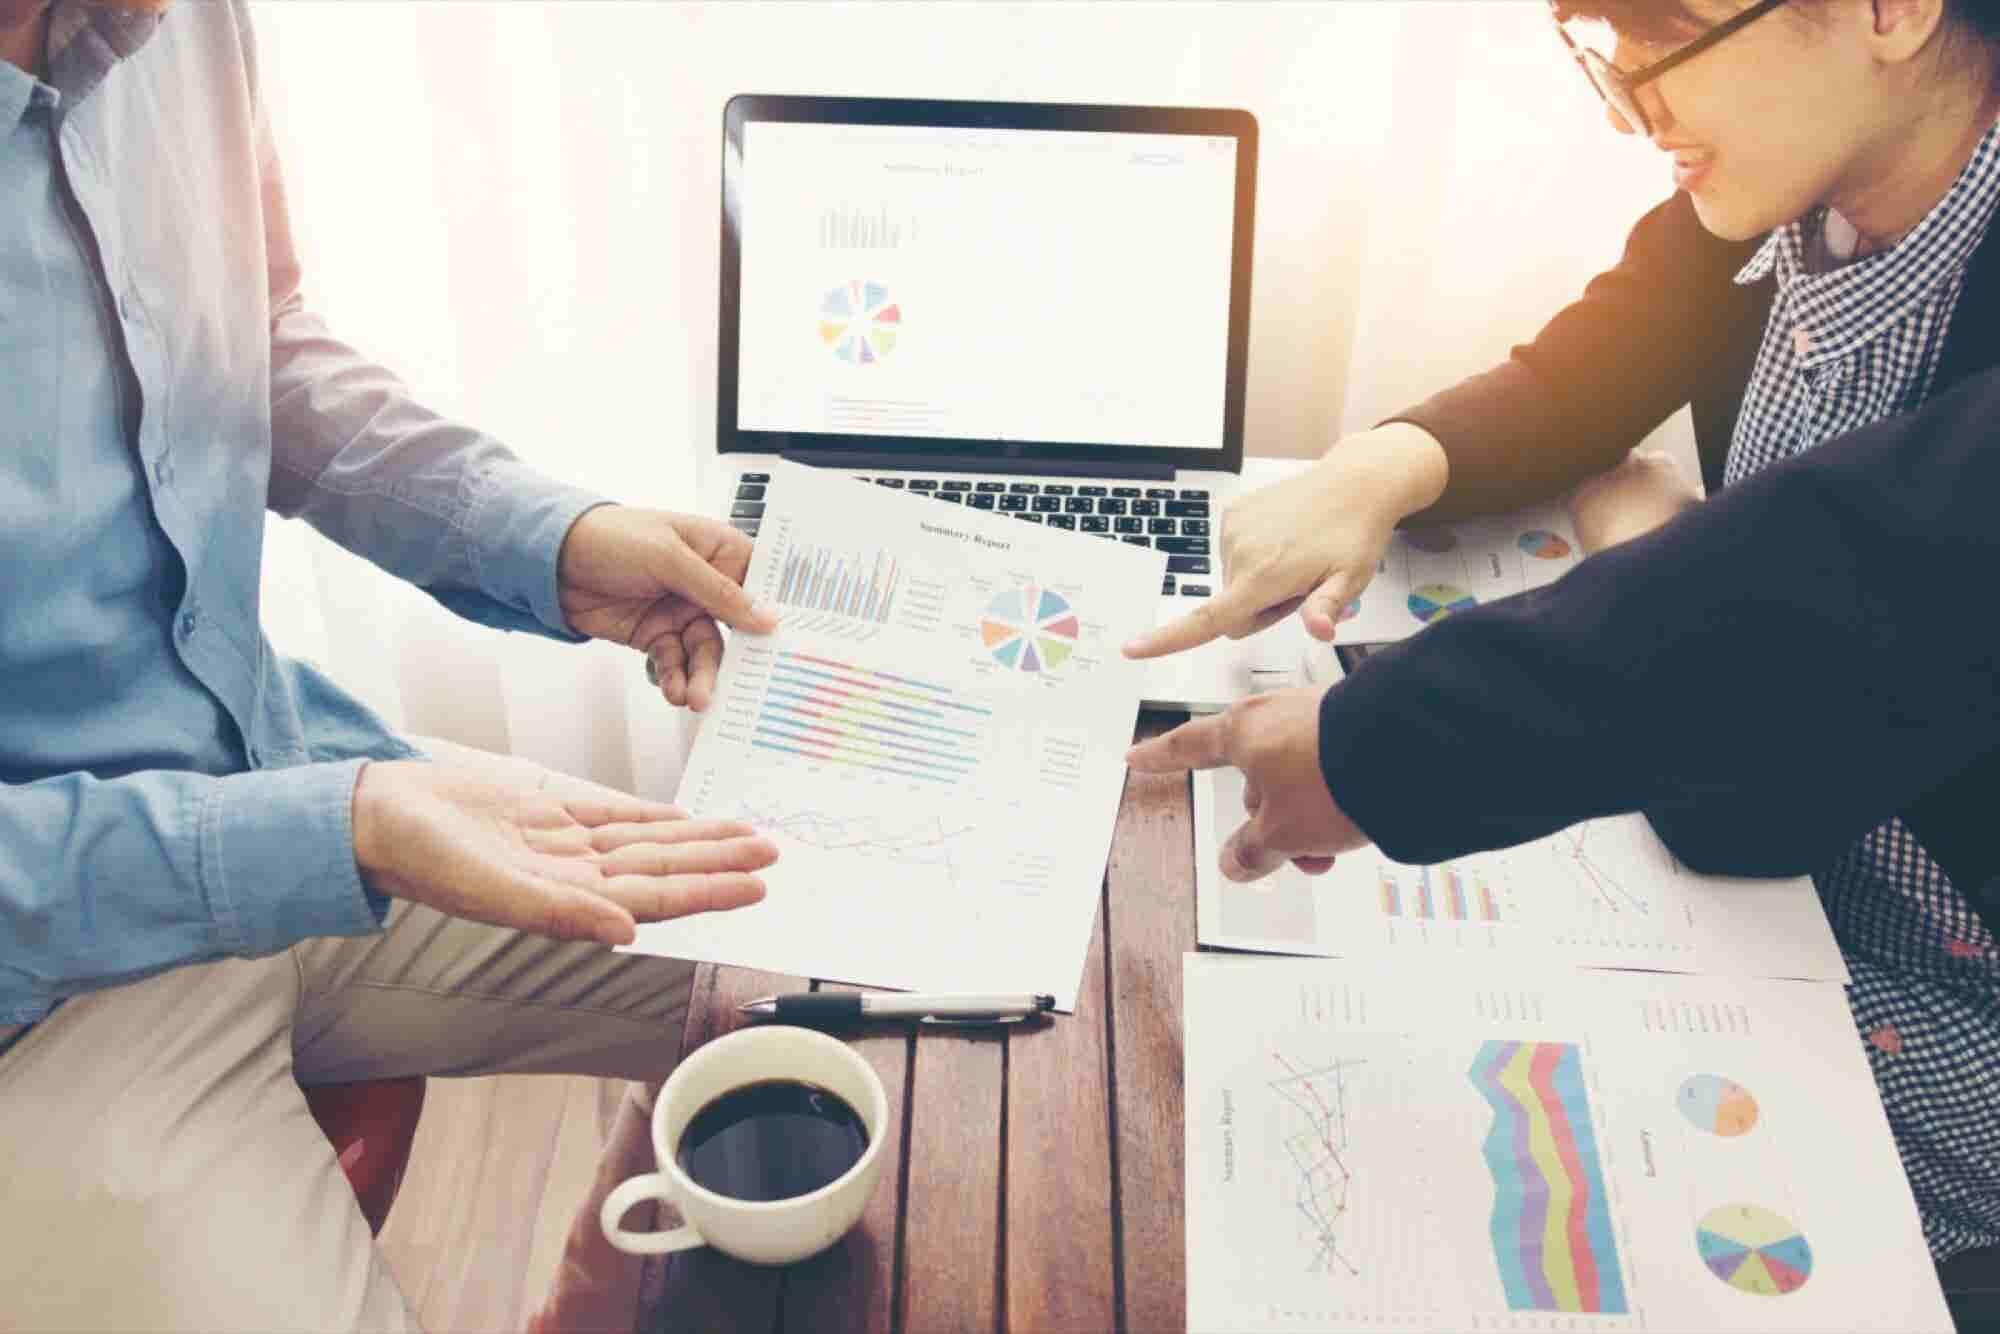 8 Rules for Succeeding as an Entrepreneur